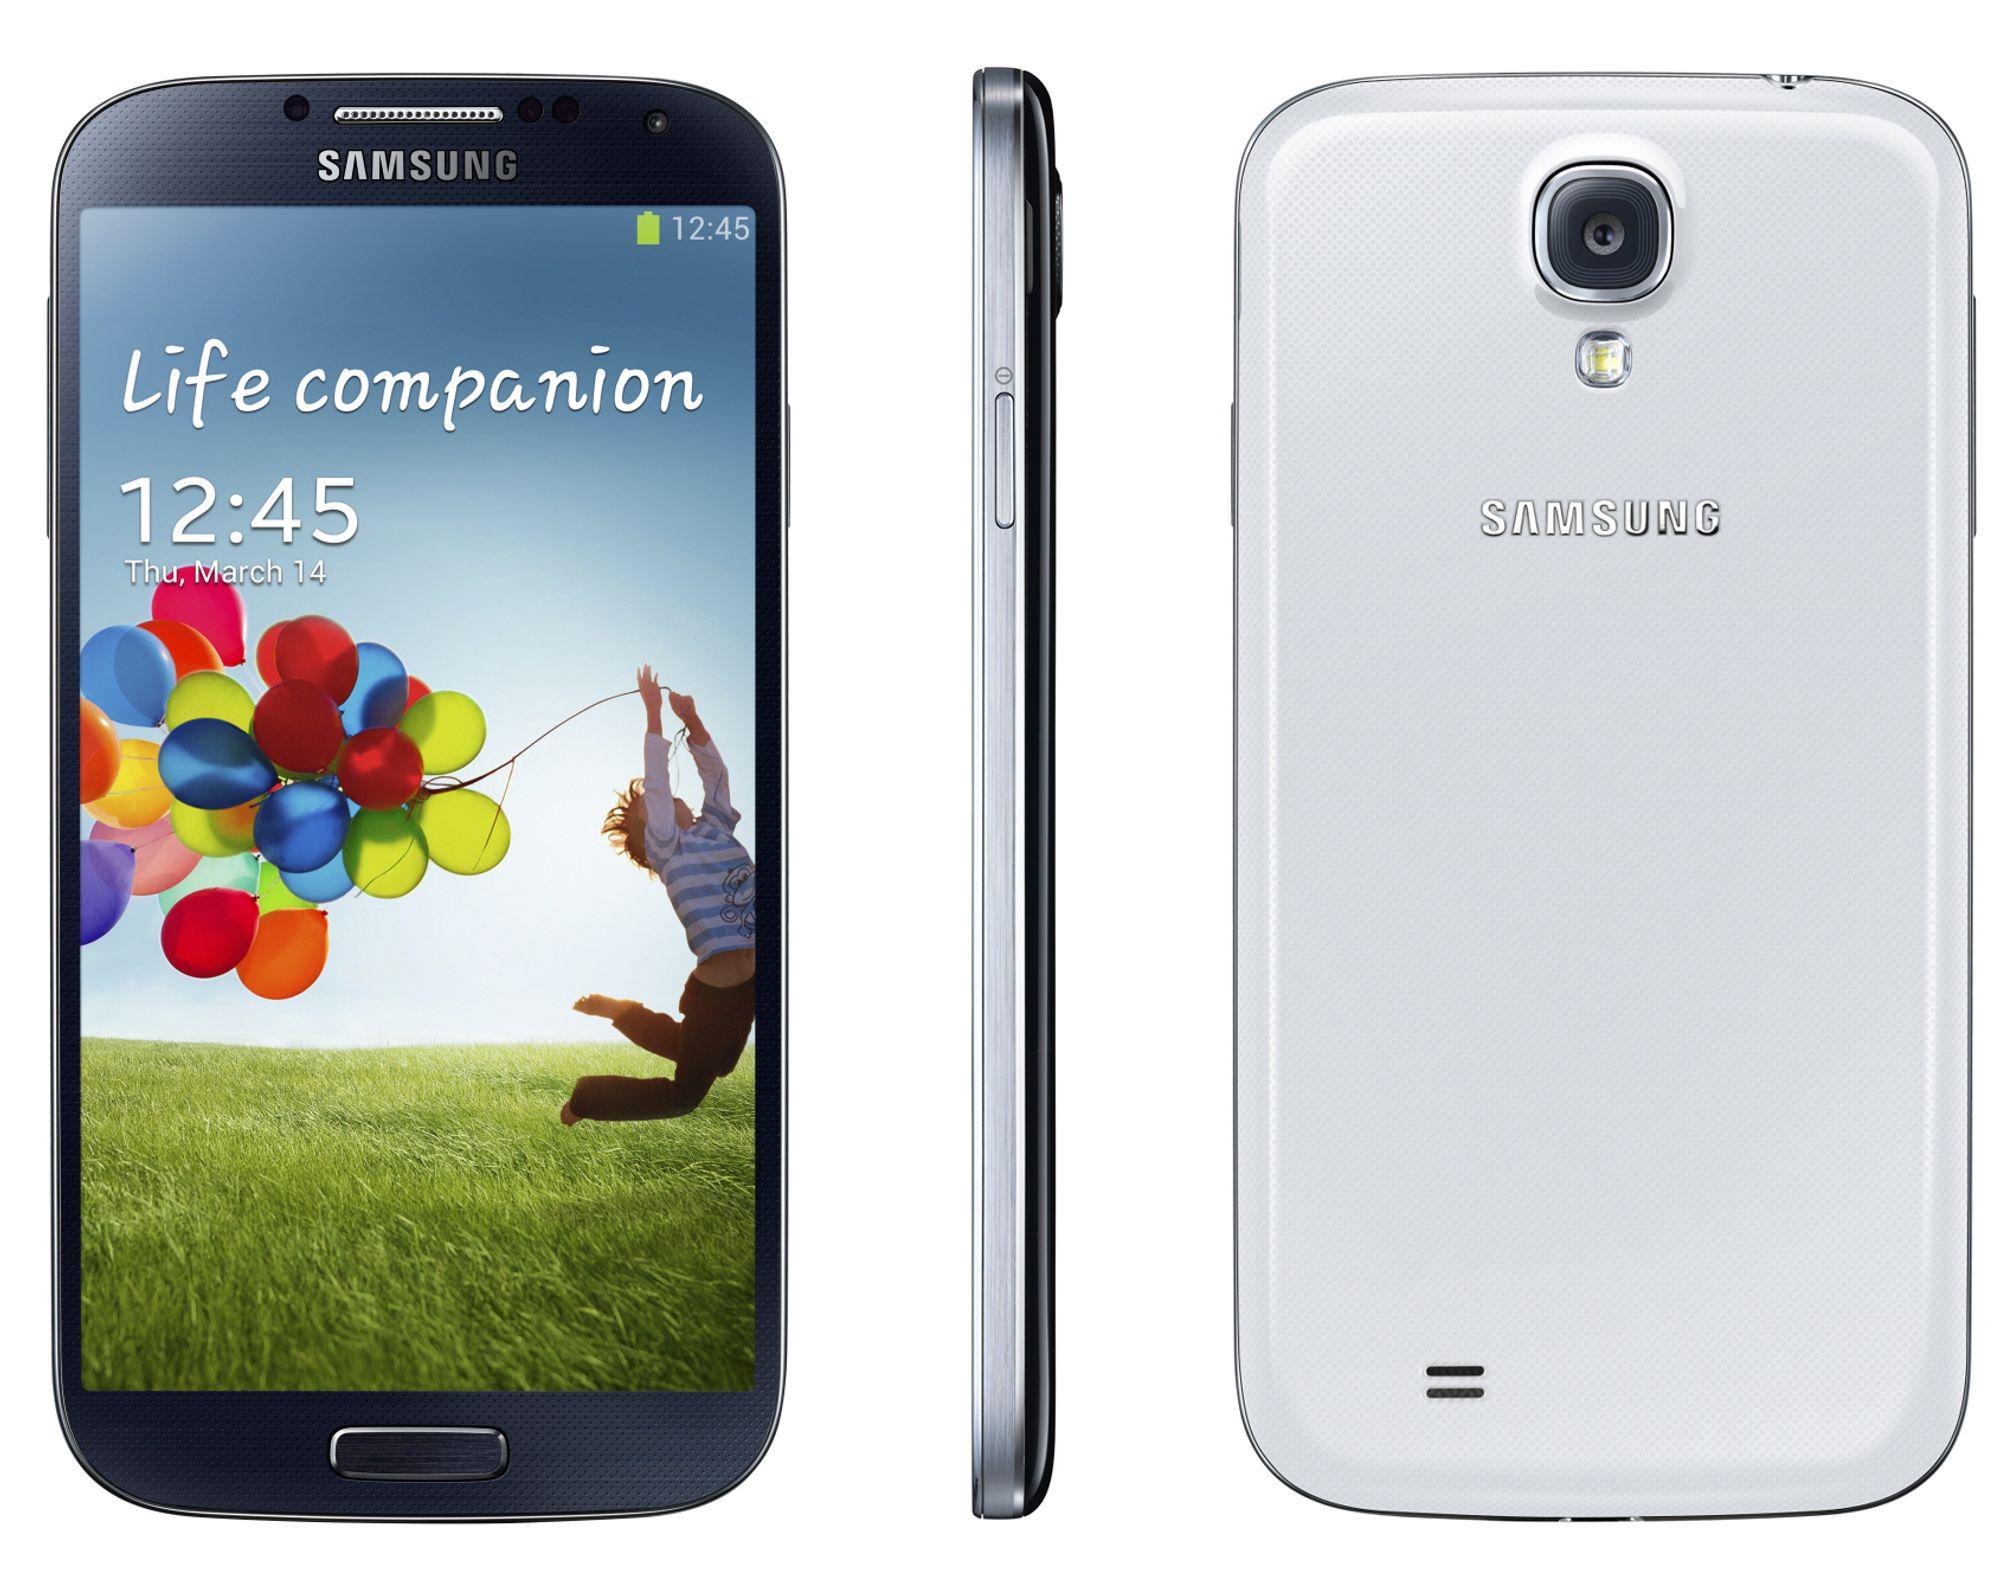 Galaxy s4 phone deals uk